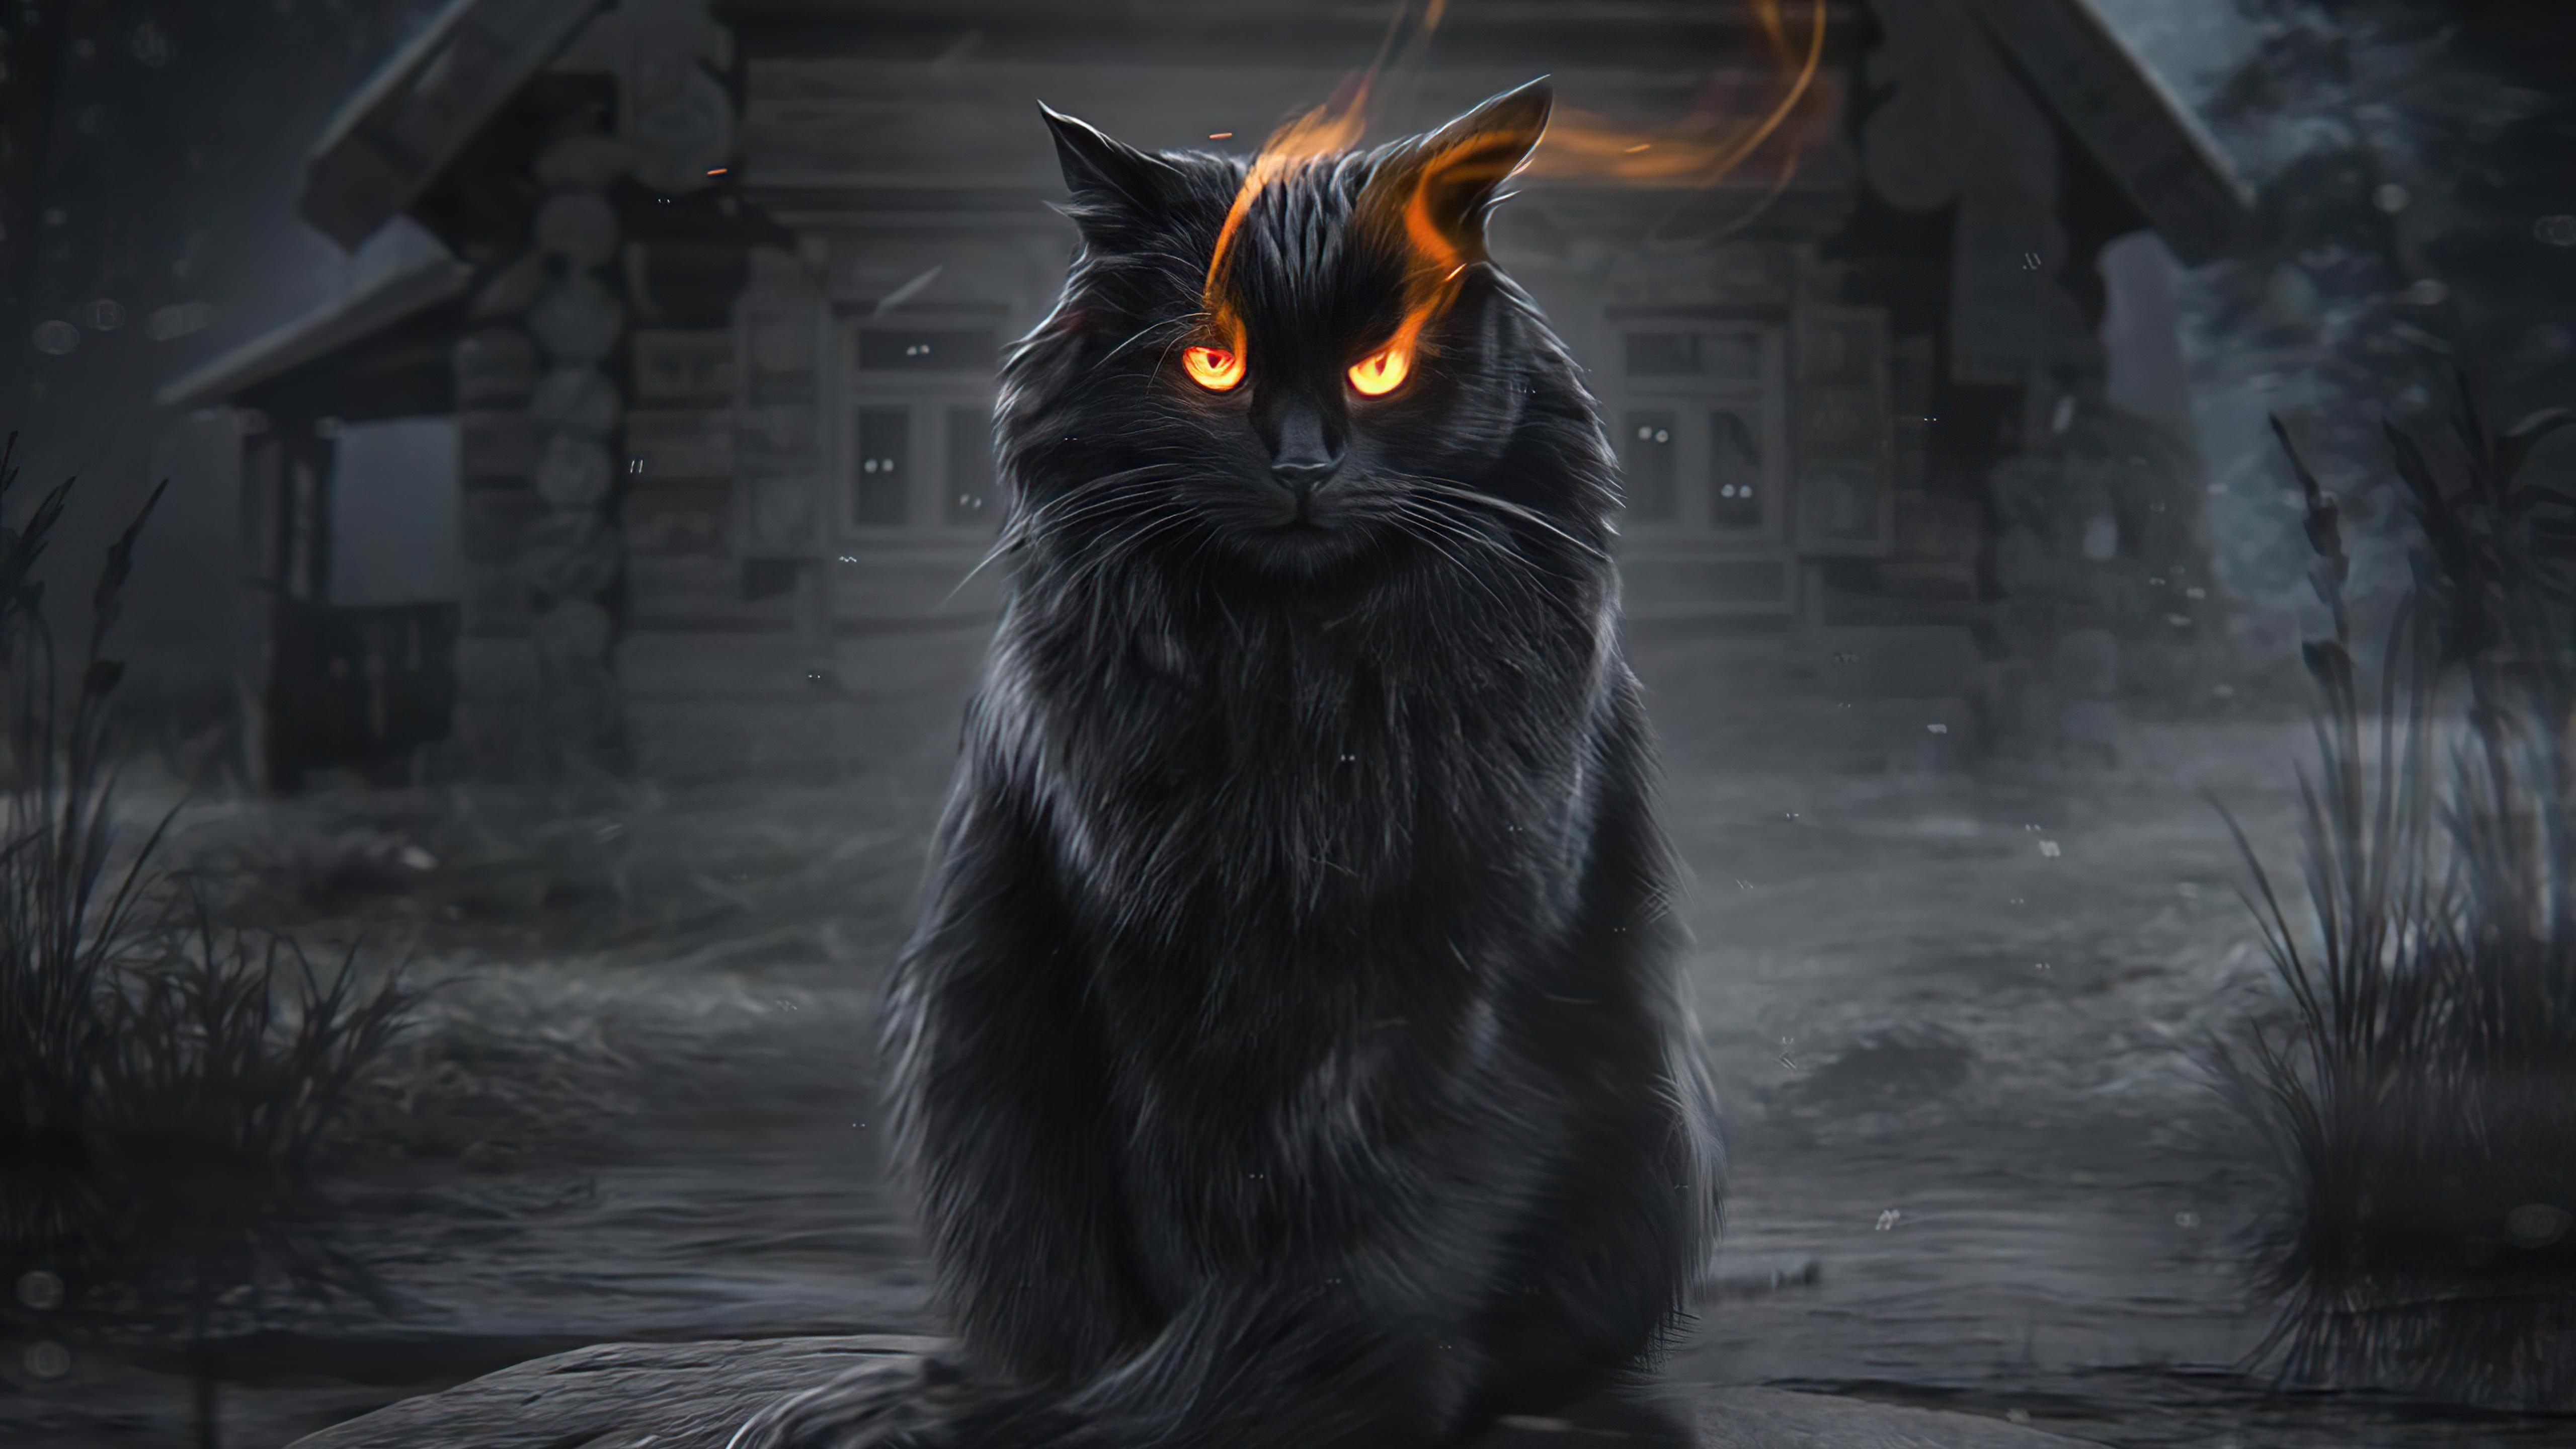 cat fire eyes 4k 1616872023 - Cat Fire Eyes 4k - Cat Fire Eyes 4k wallpapers